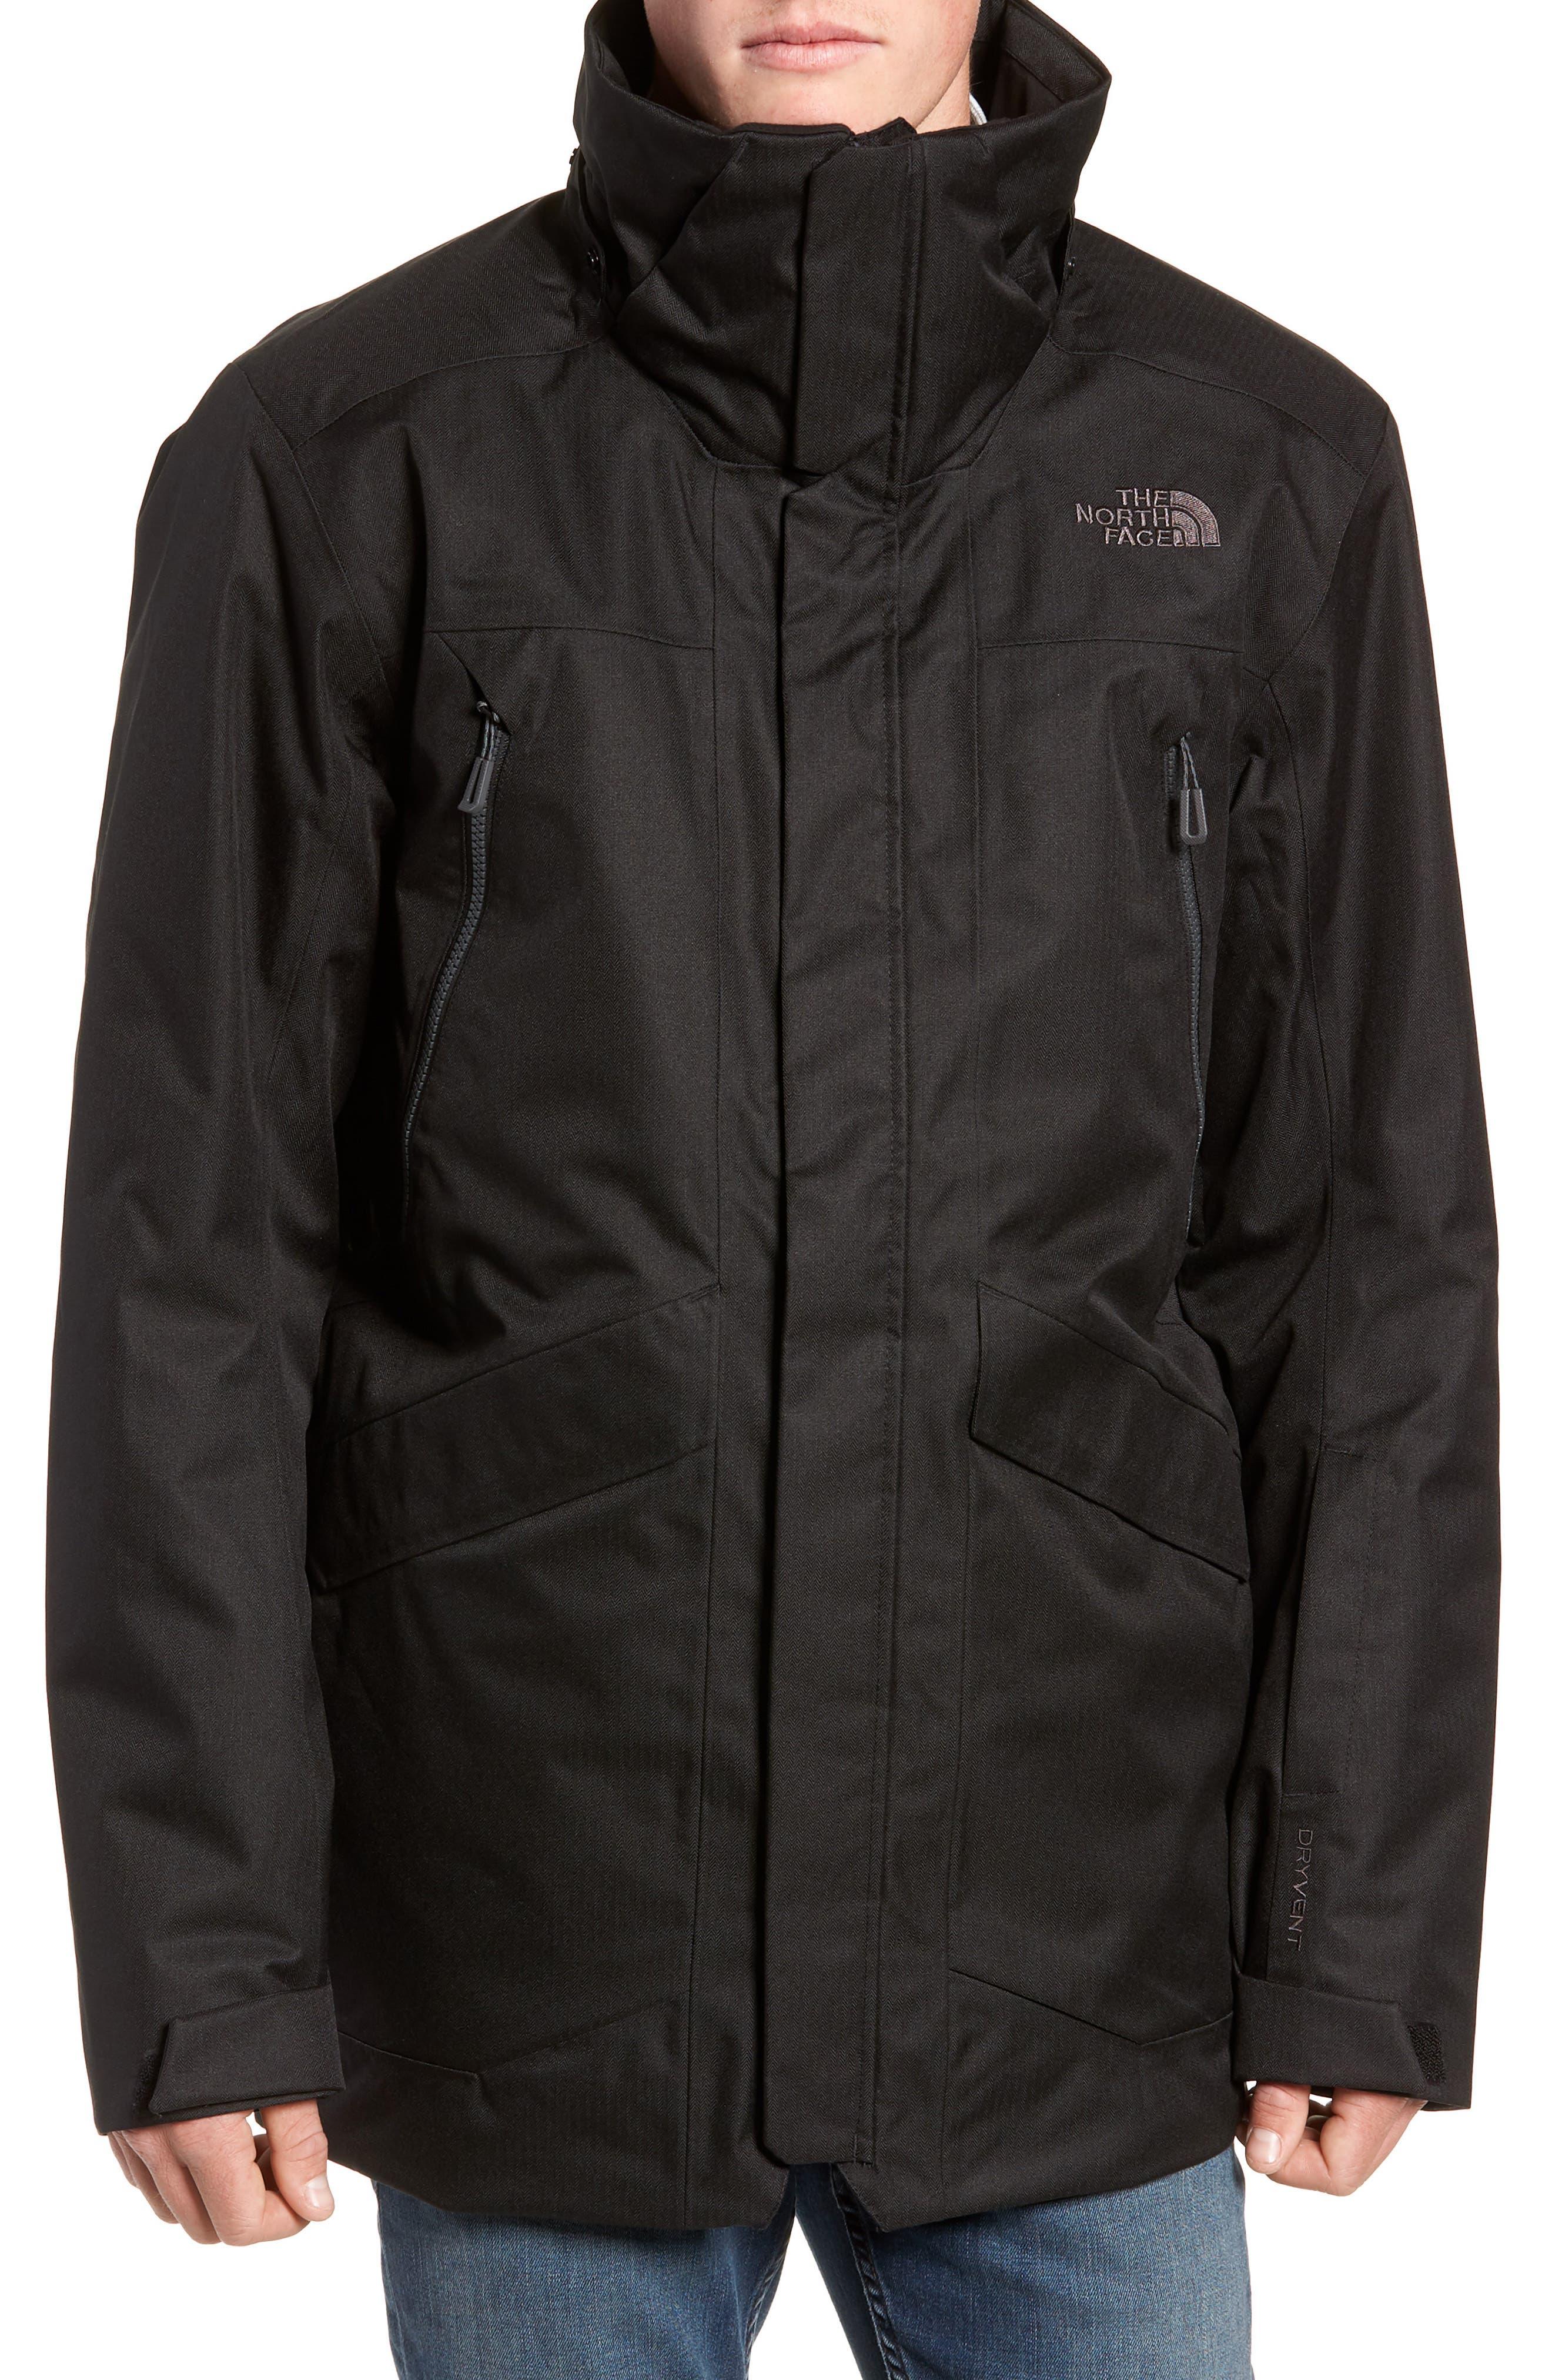 Gatekeeper Waterproof Jacket,                             Alternate thumbnail 4, color,                             TNF BLACK/TNF BLACK